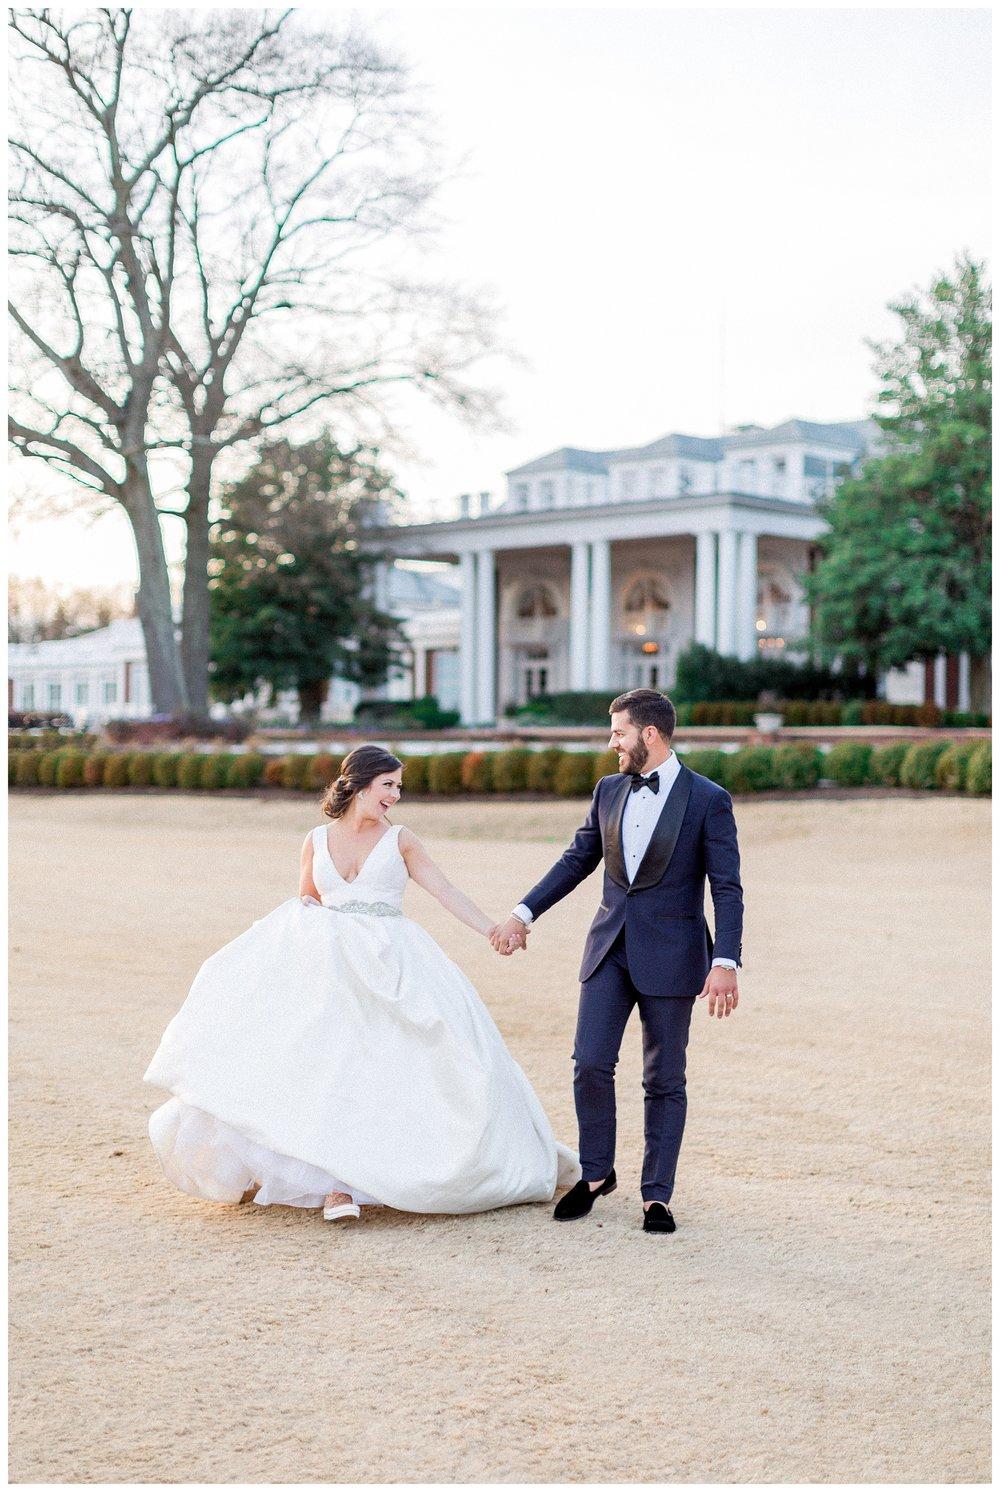 Country Club of Virginia Wedding | Richmond Wedding Photographer_0143.jpg